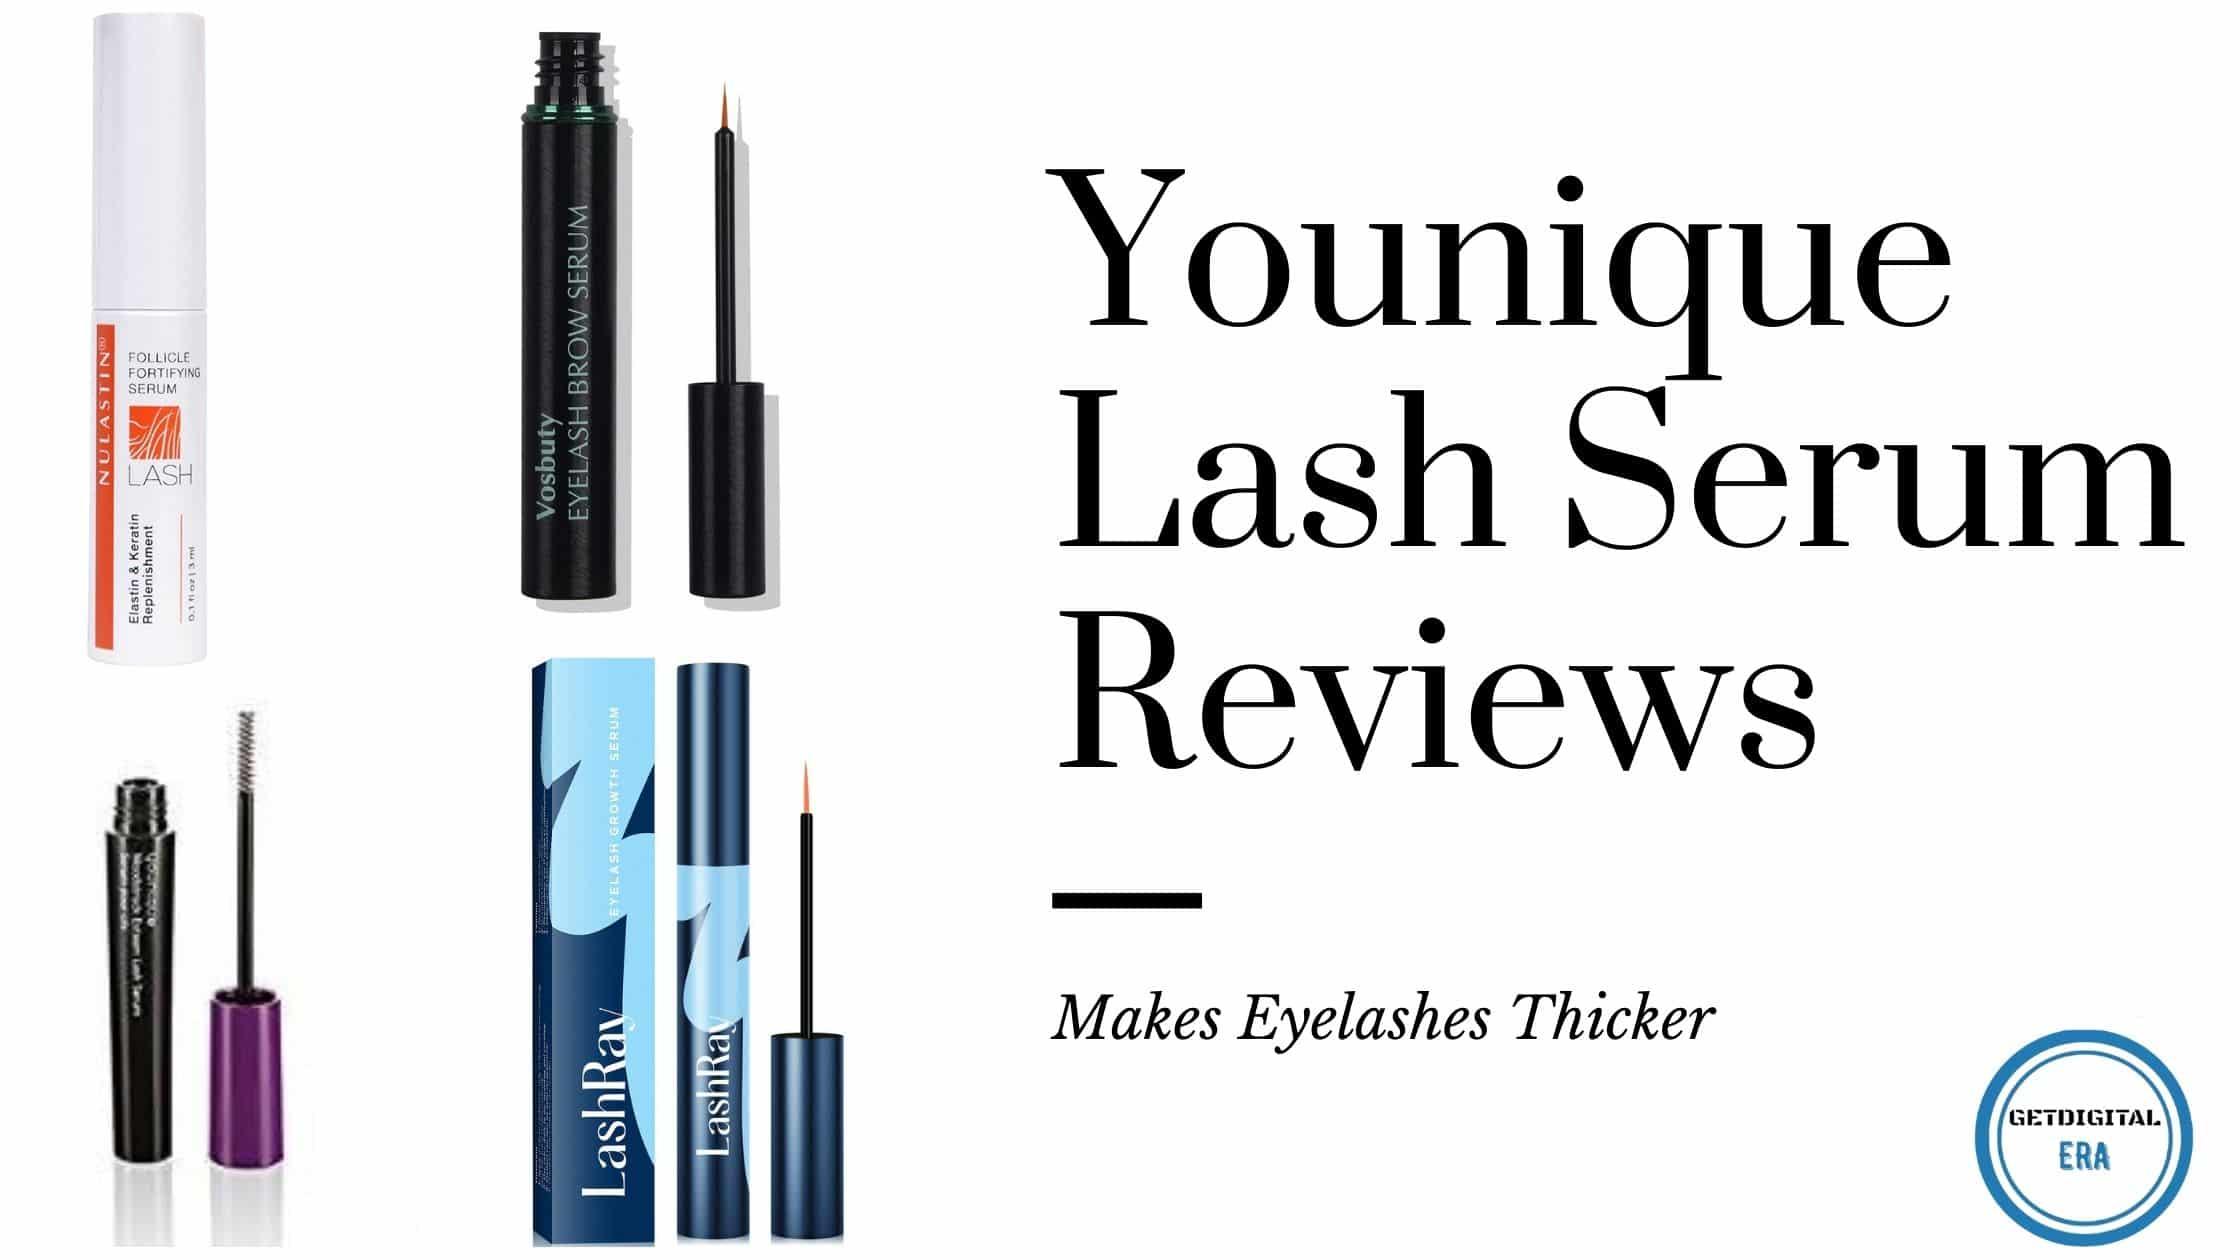 Younique Lash Serum Reviews